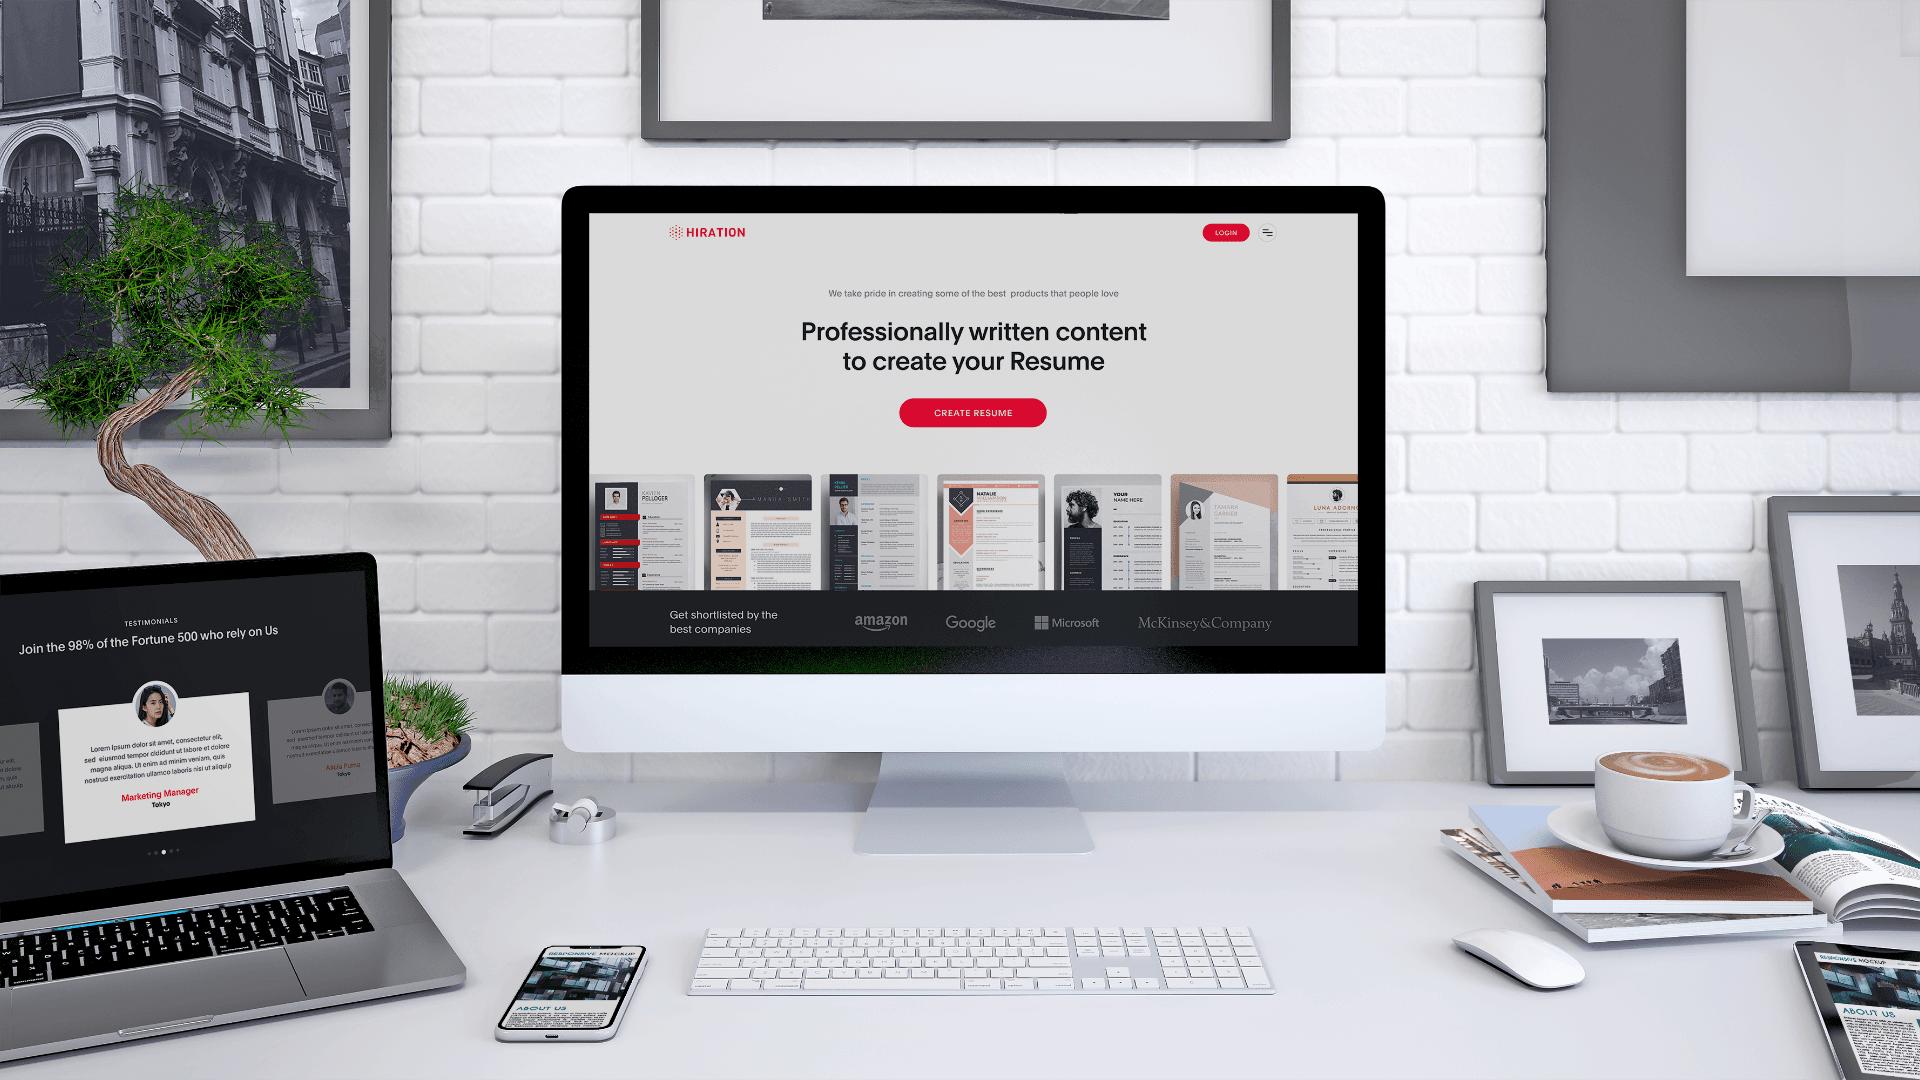 Web Design for Hiration